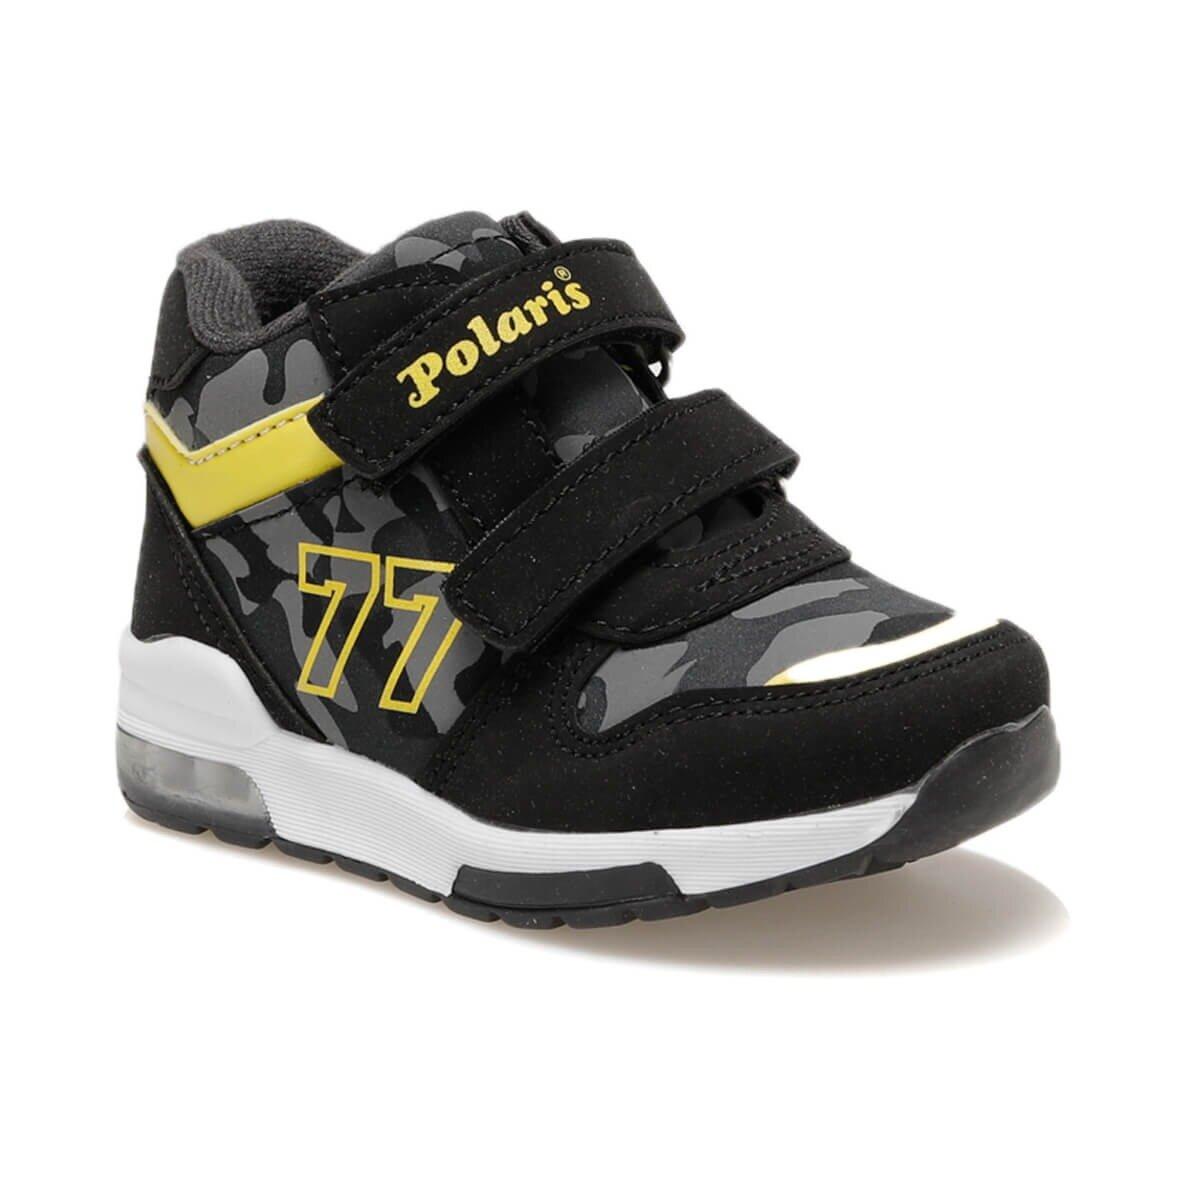 FLO 92.510542.B Black Male Child Sports Shoes Polaris